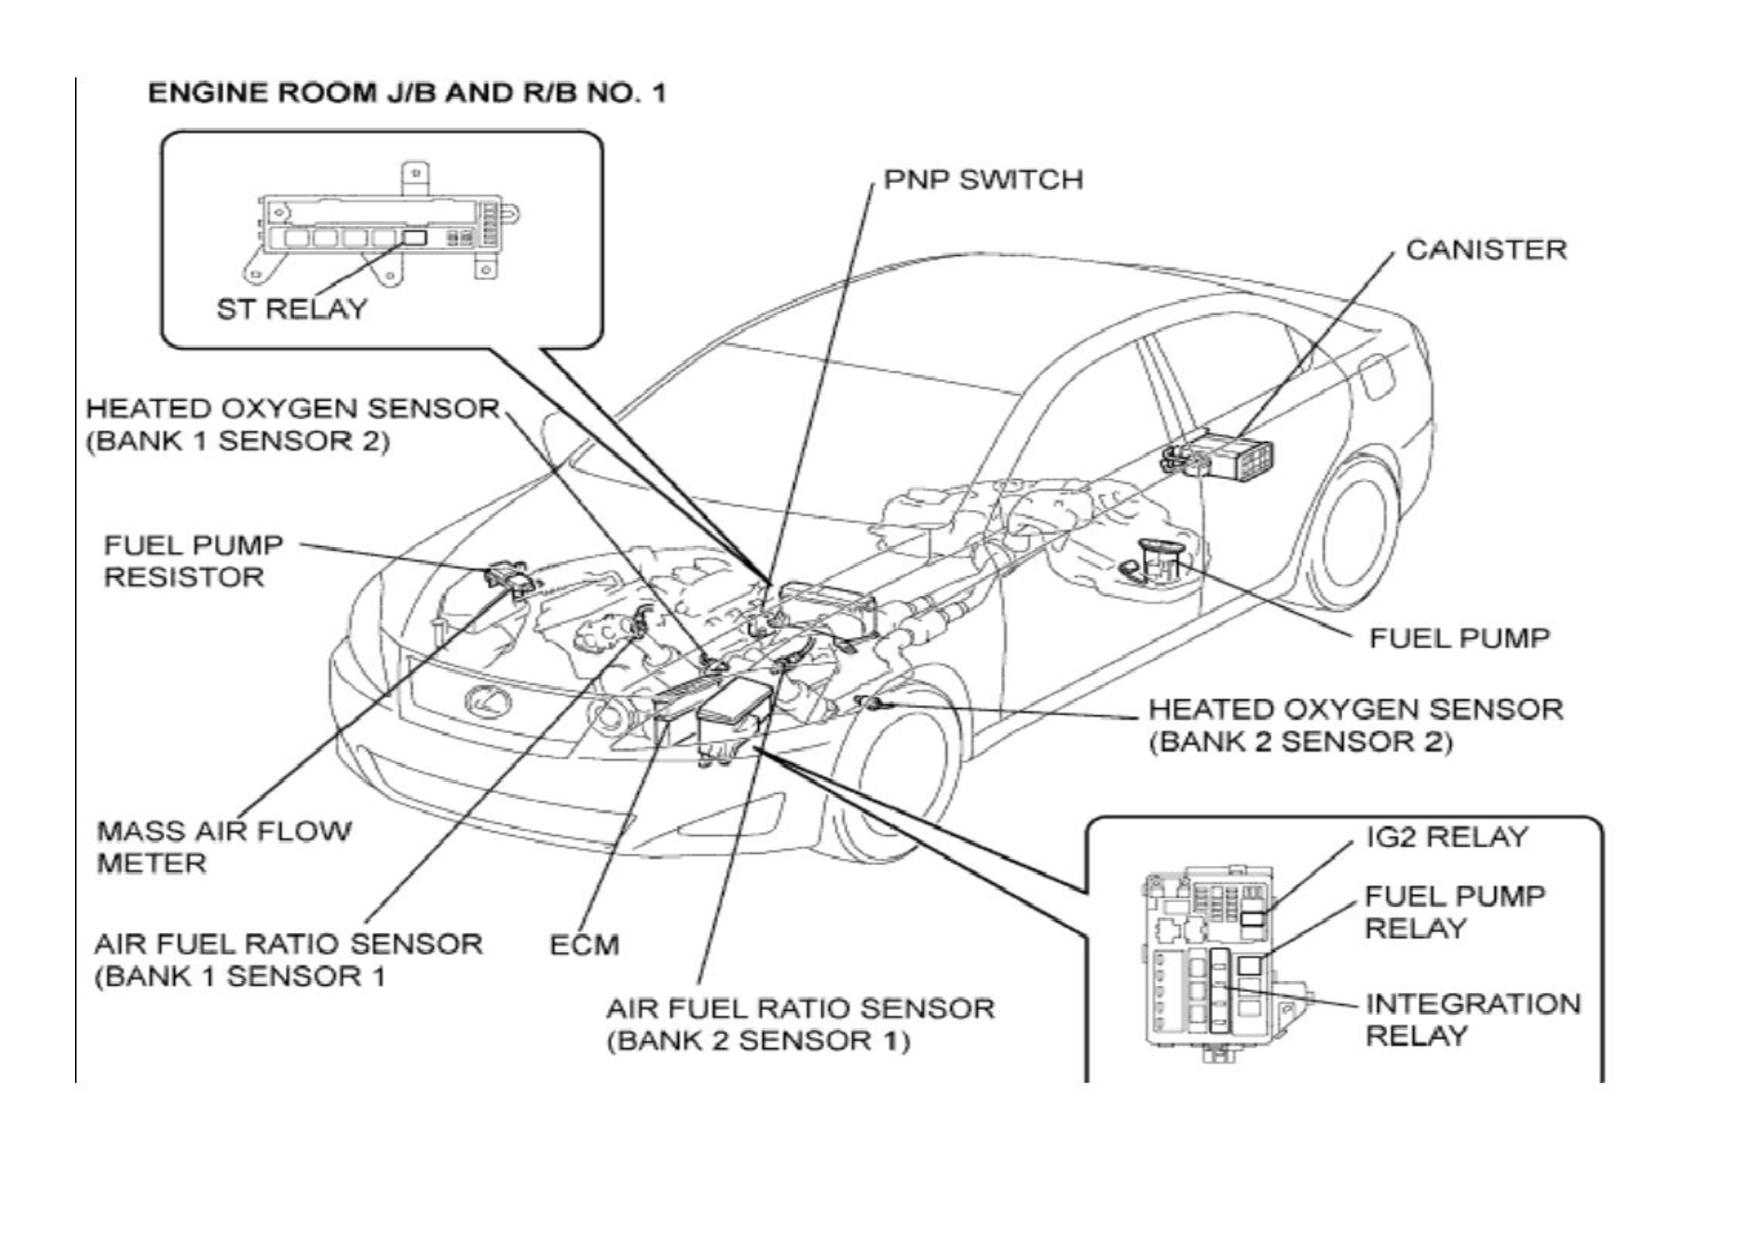 hight resolution of 2000 lexus es300 engine diagram also 2000 lexus rx300 bank 2 sensor wiring diagram bank 1 sensor 2 location lexus es300 2002 lexus es300